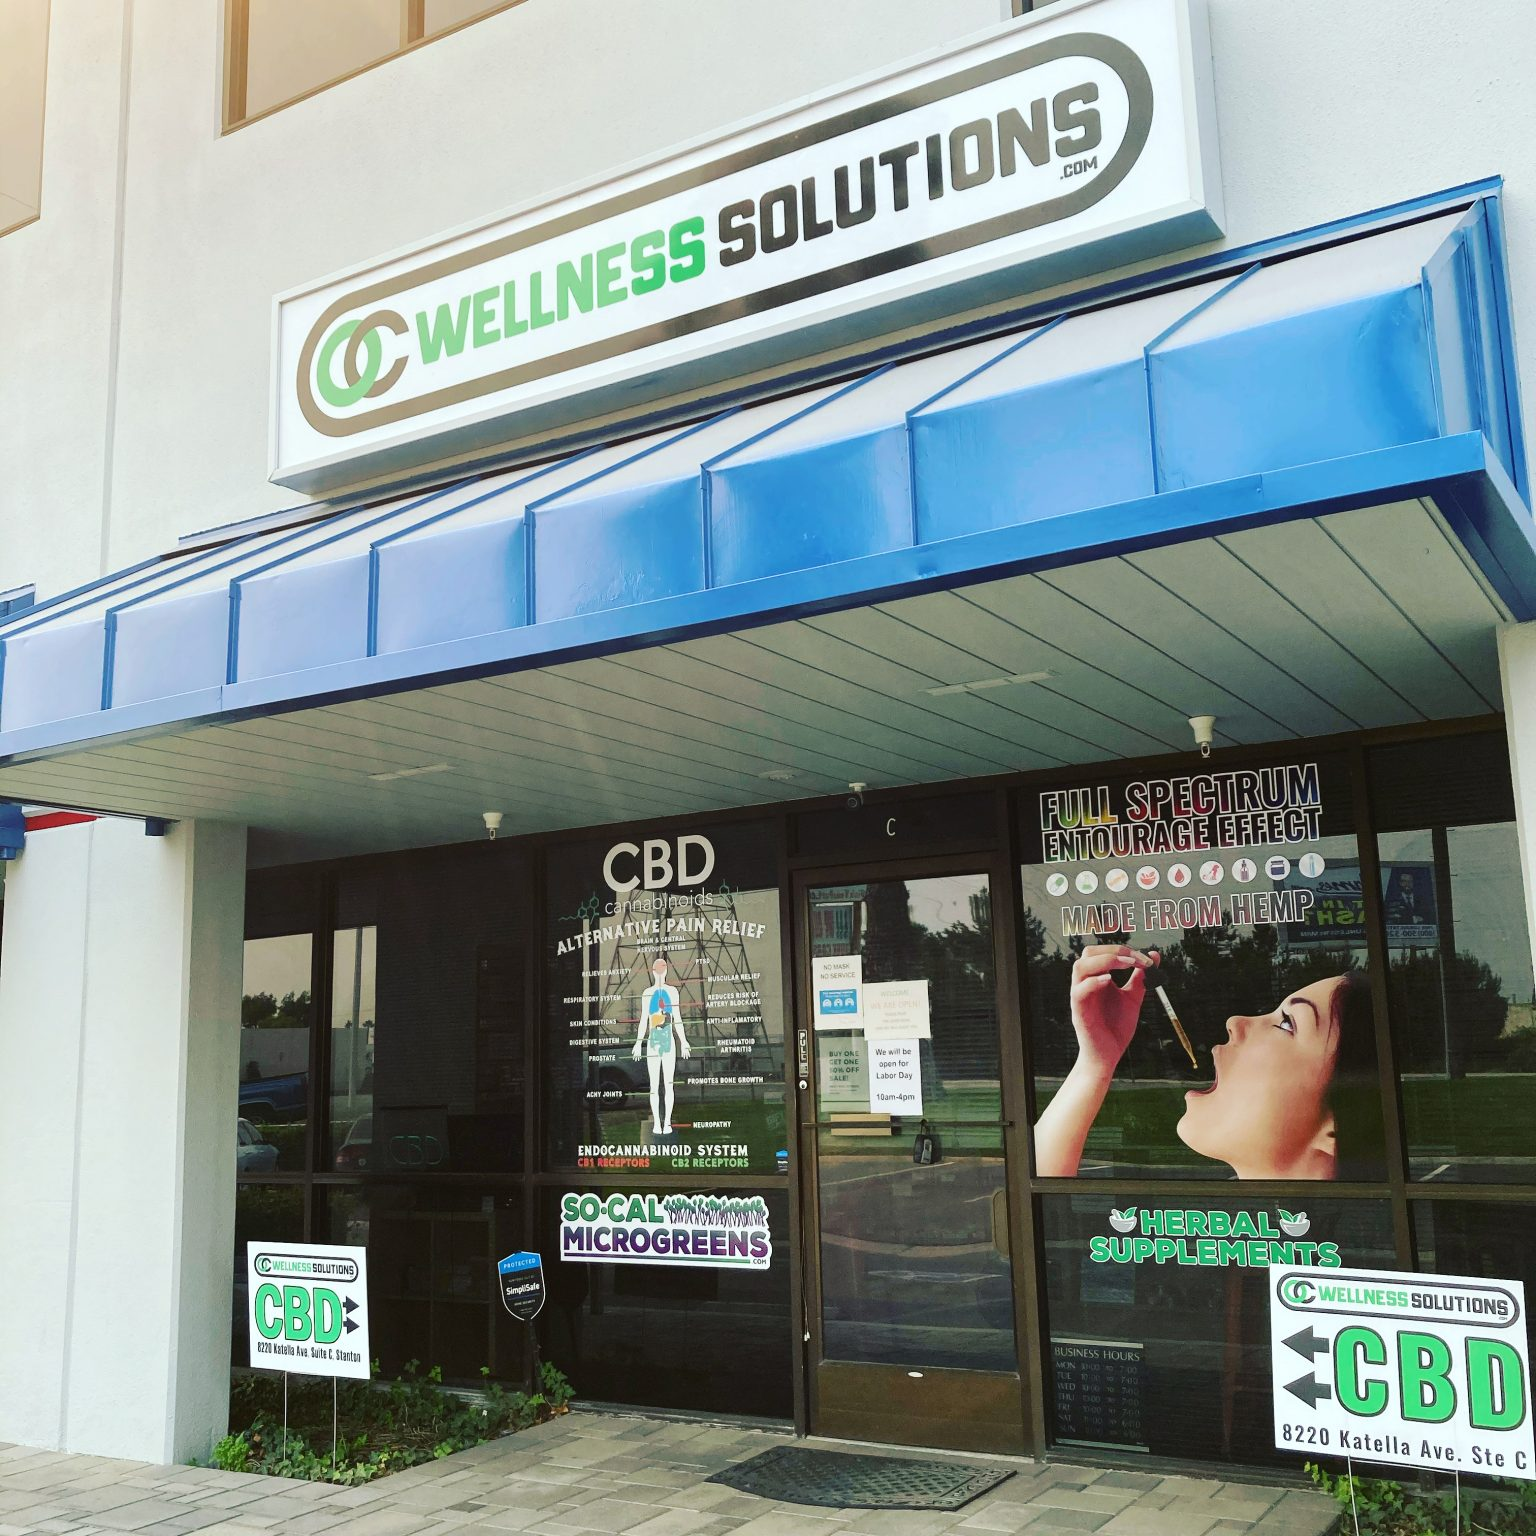 CBD OC Wellness Solutions Storefront in Stanton, California